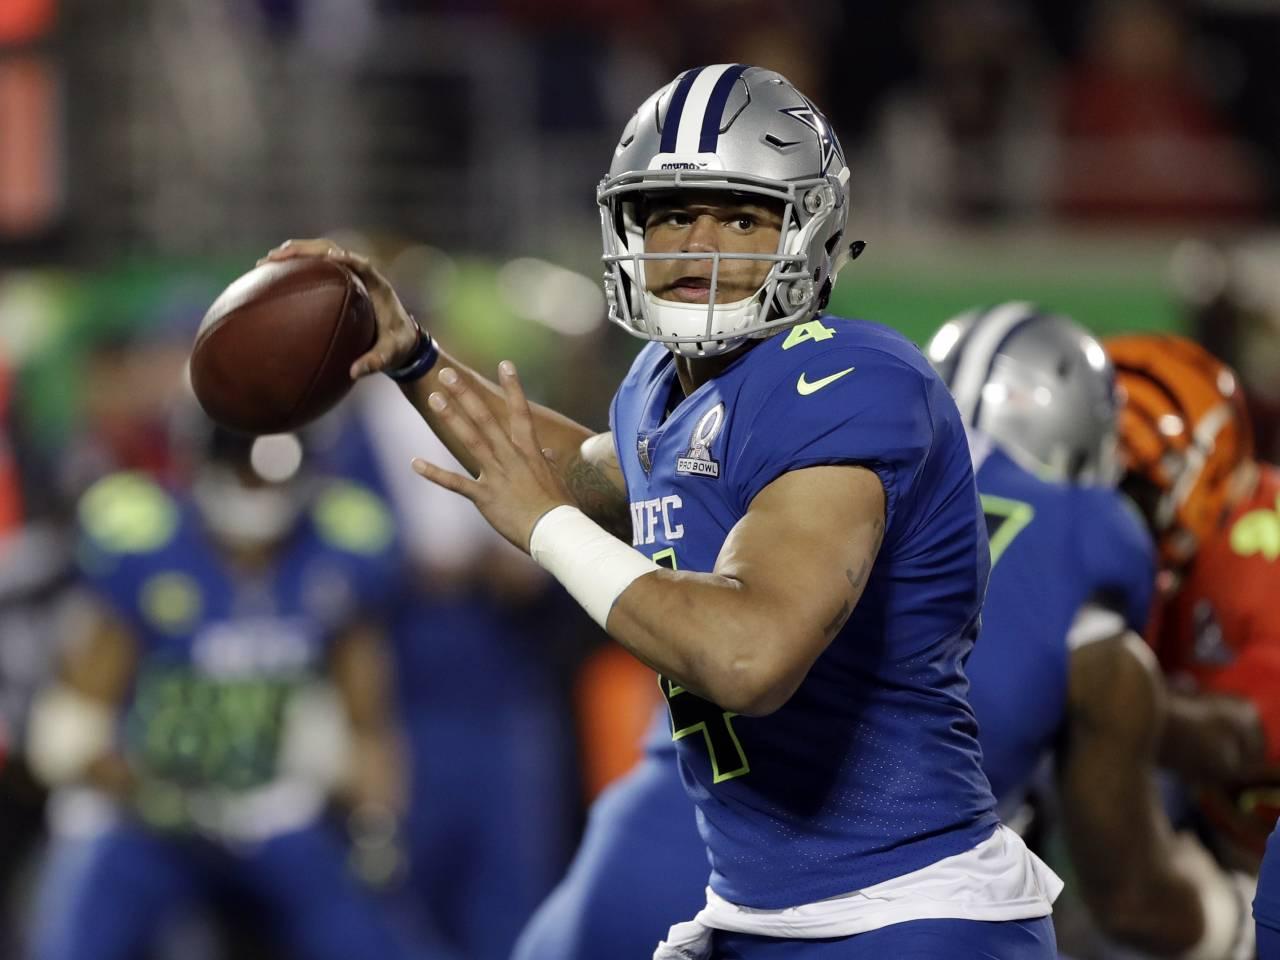 Pro Bowl skills challenge airs tonight, featuring Browns' Joe Thomas playing dodgeball